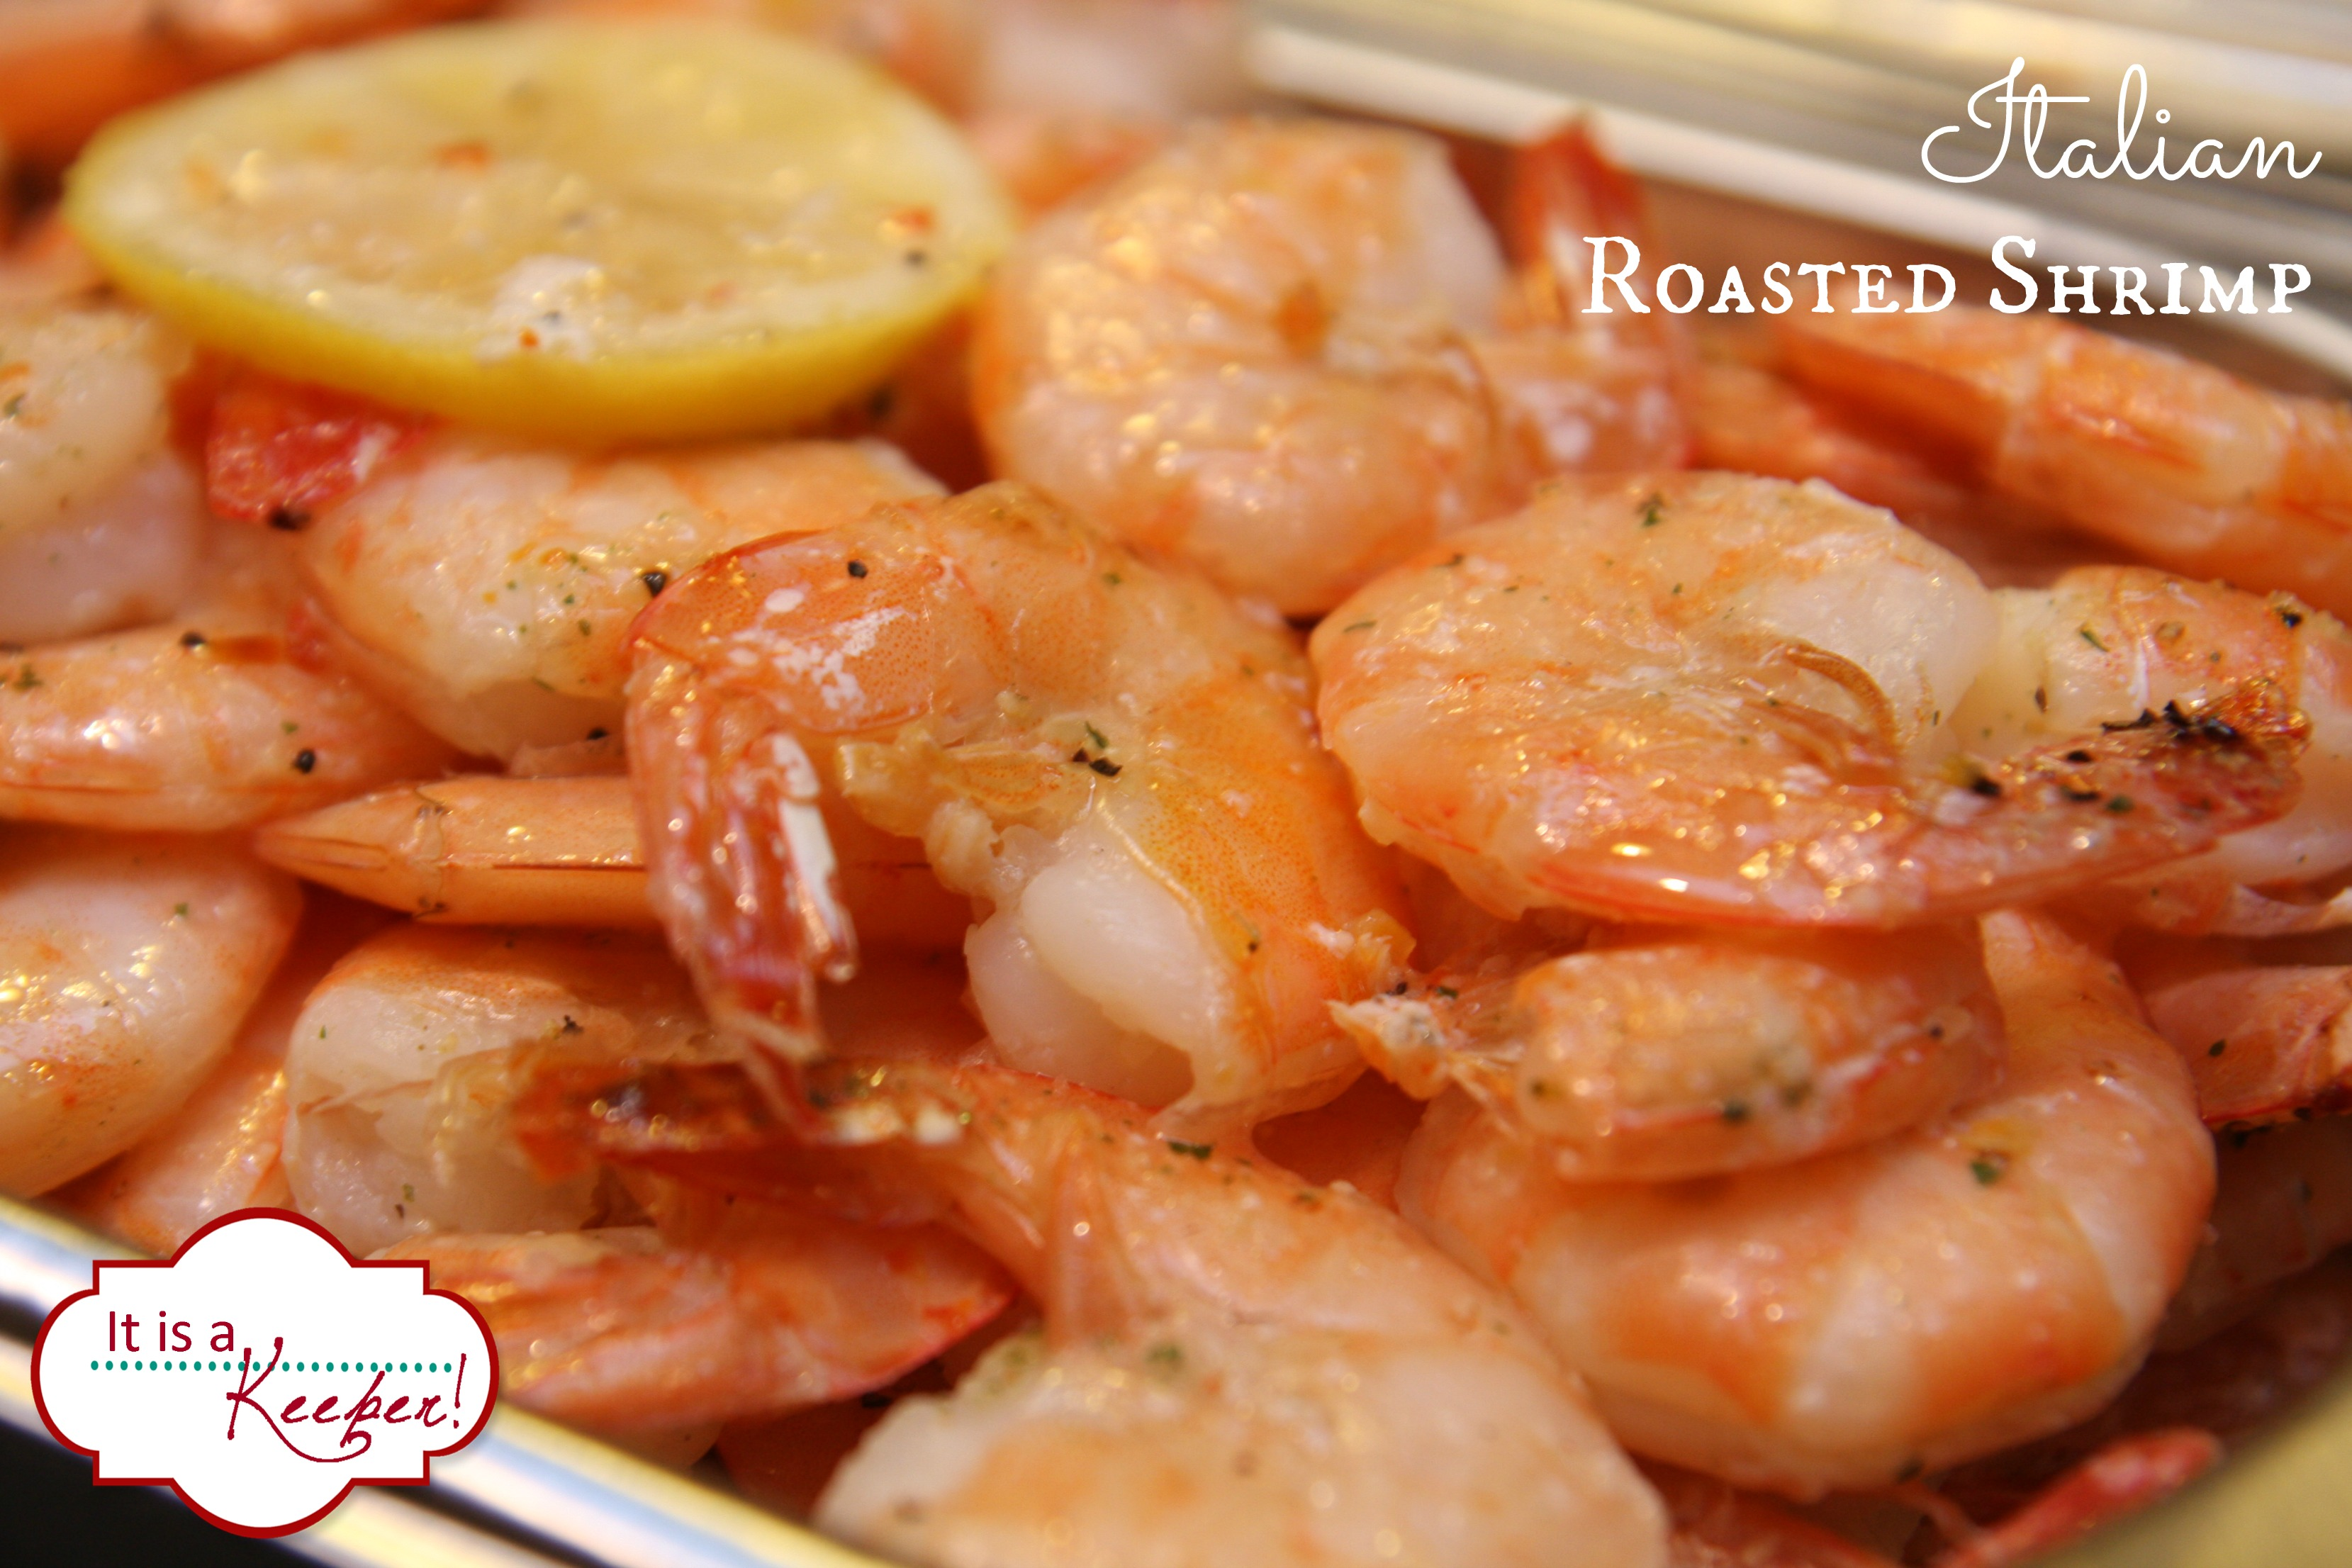 Roasted Italian Shrimp: An Easy Shrimp Recipe